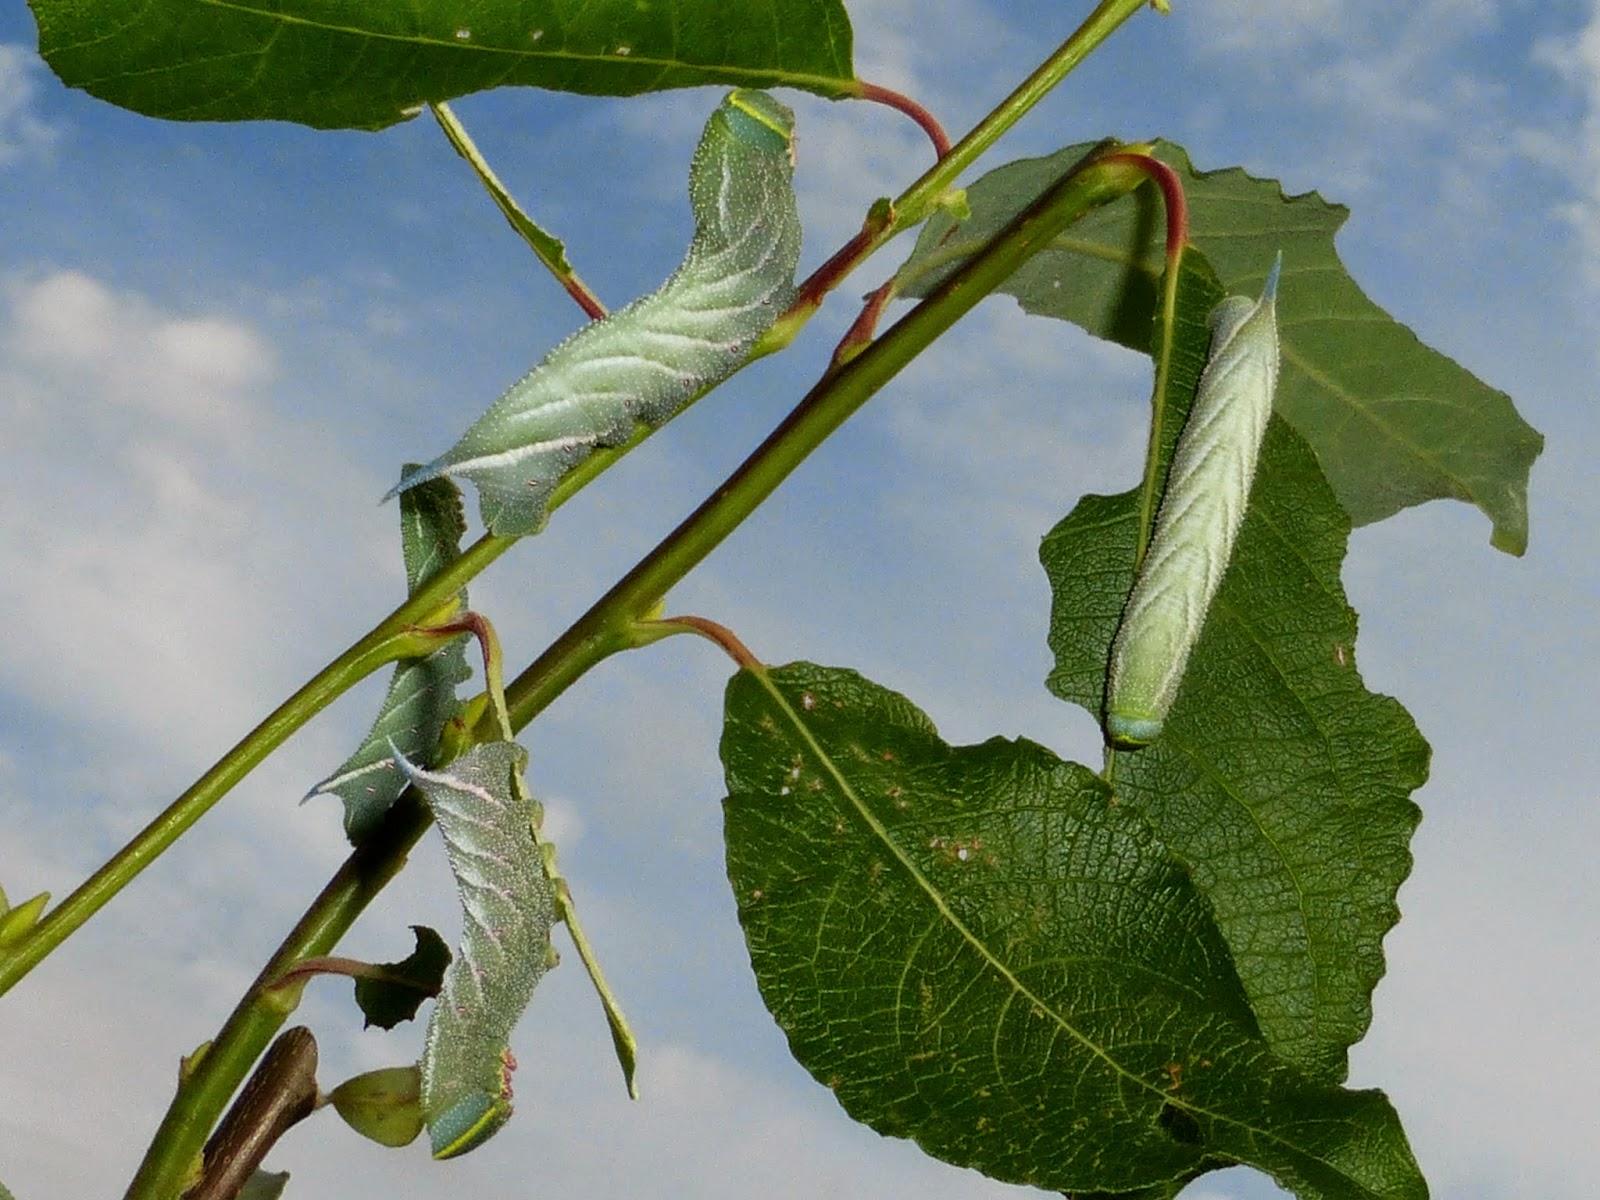 Smerinthus ocellata caterpillar L4